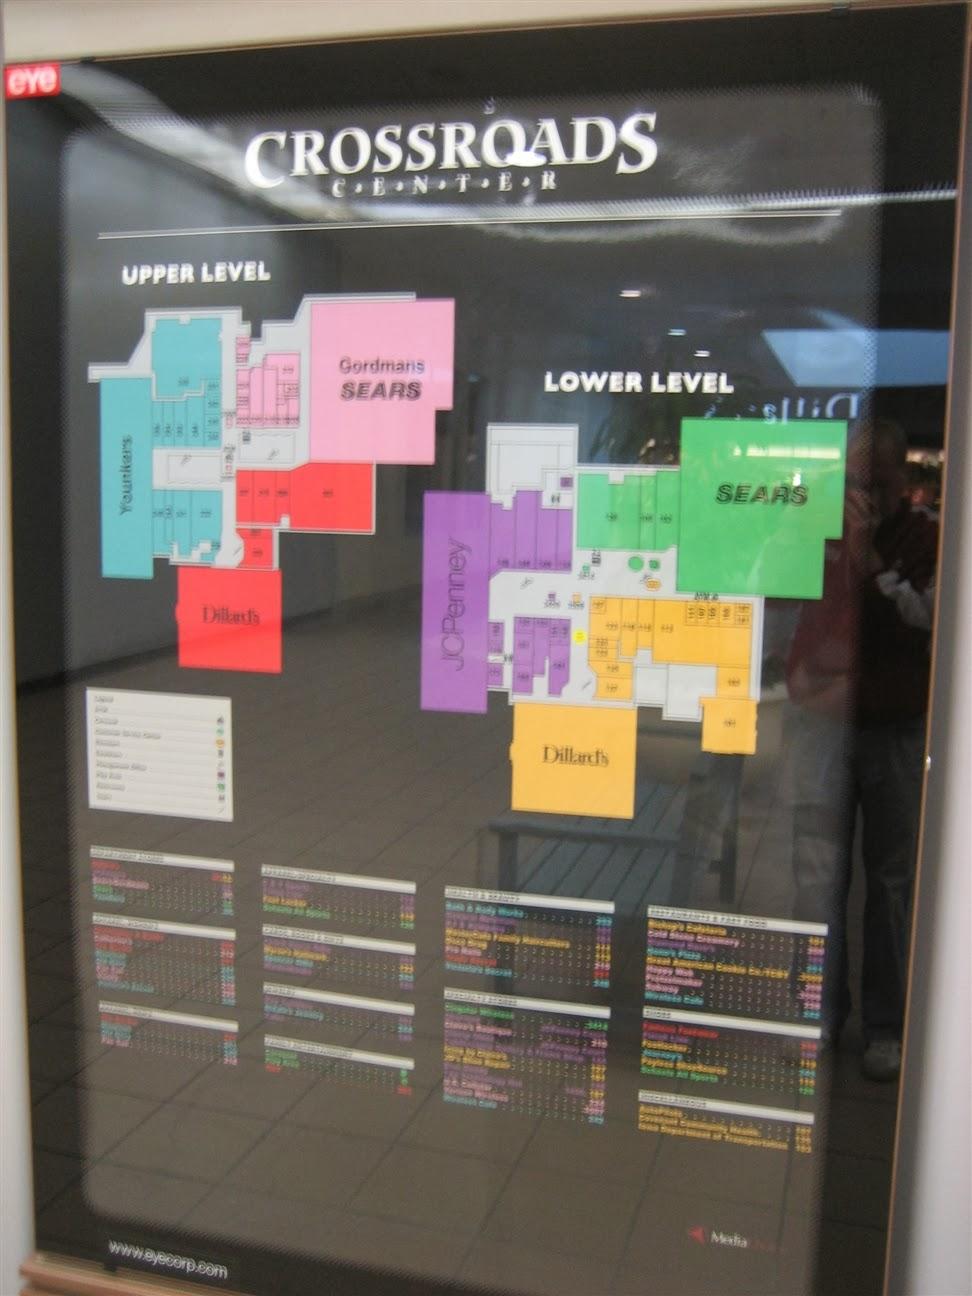 Crossroads Shopping Center Directory